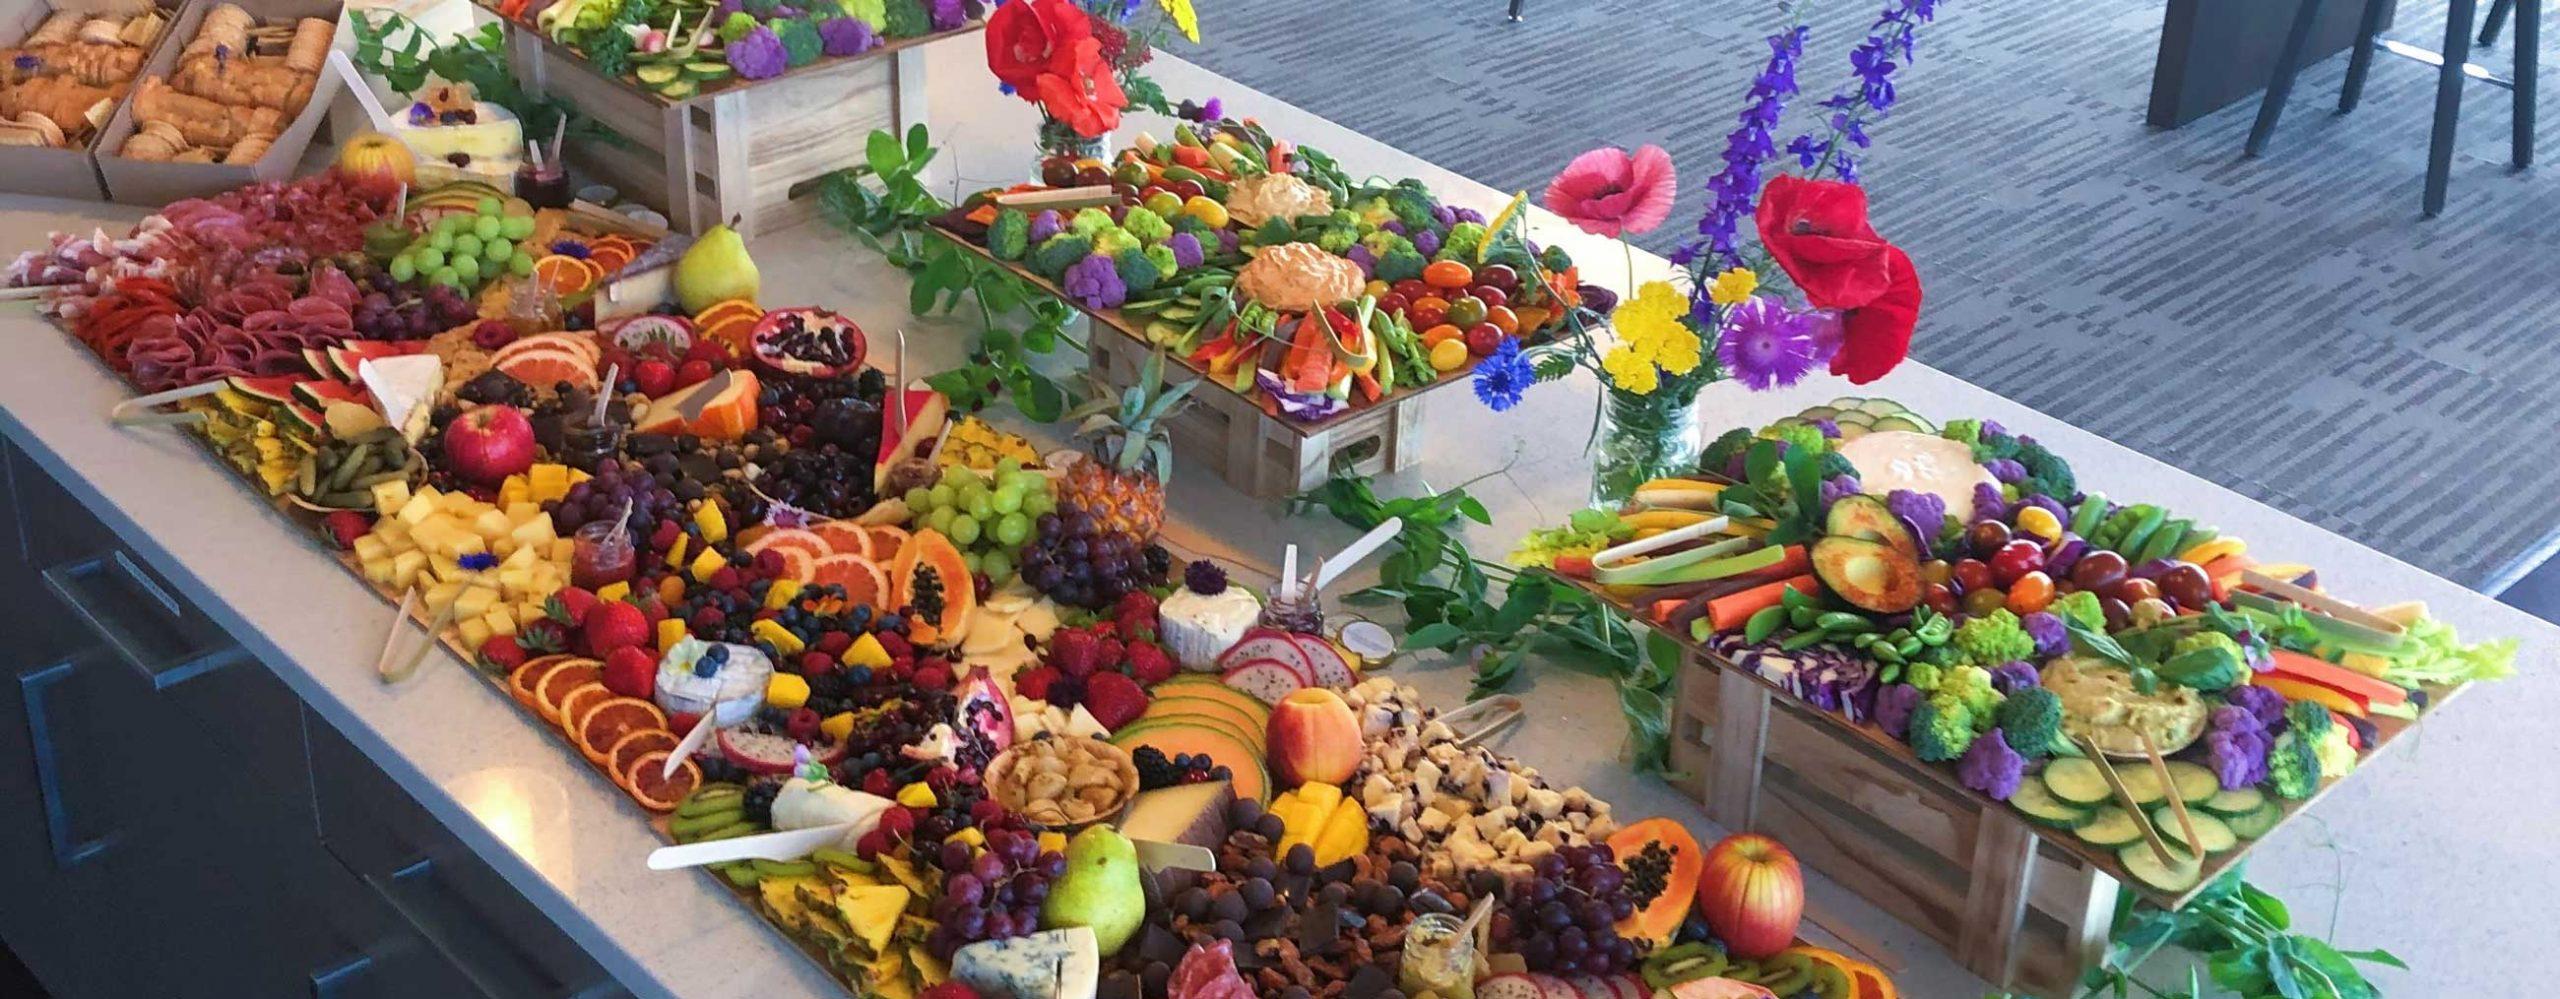 corporate catering denver colorado